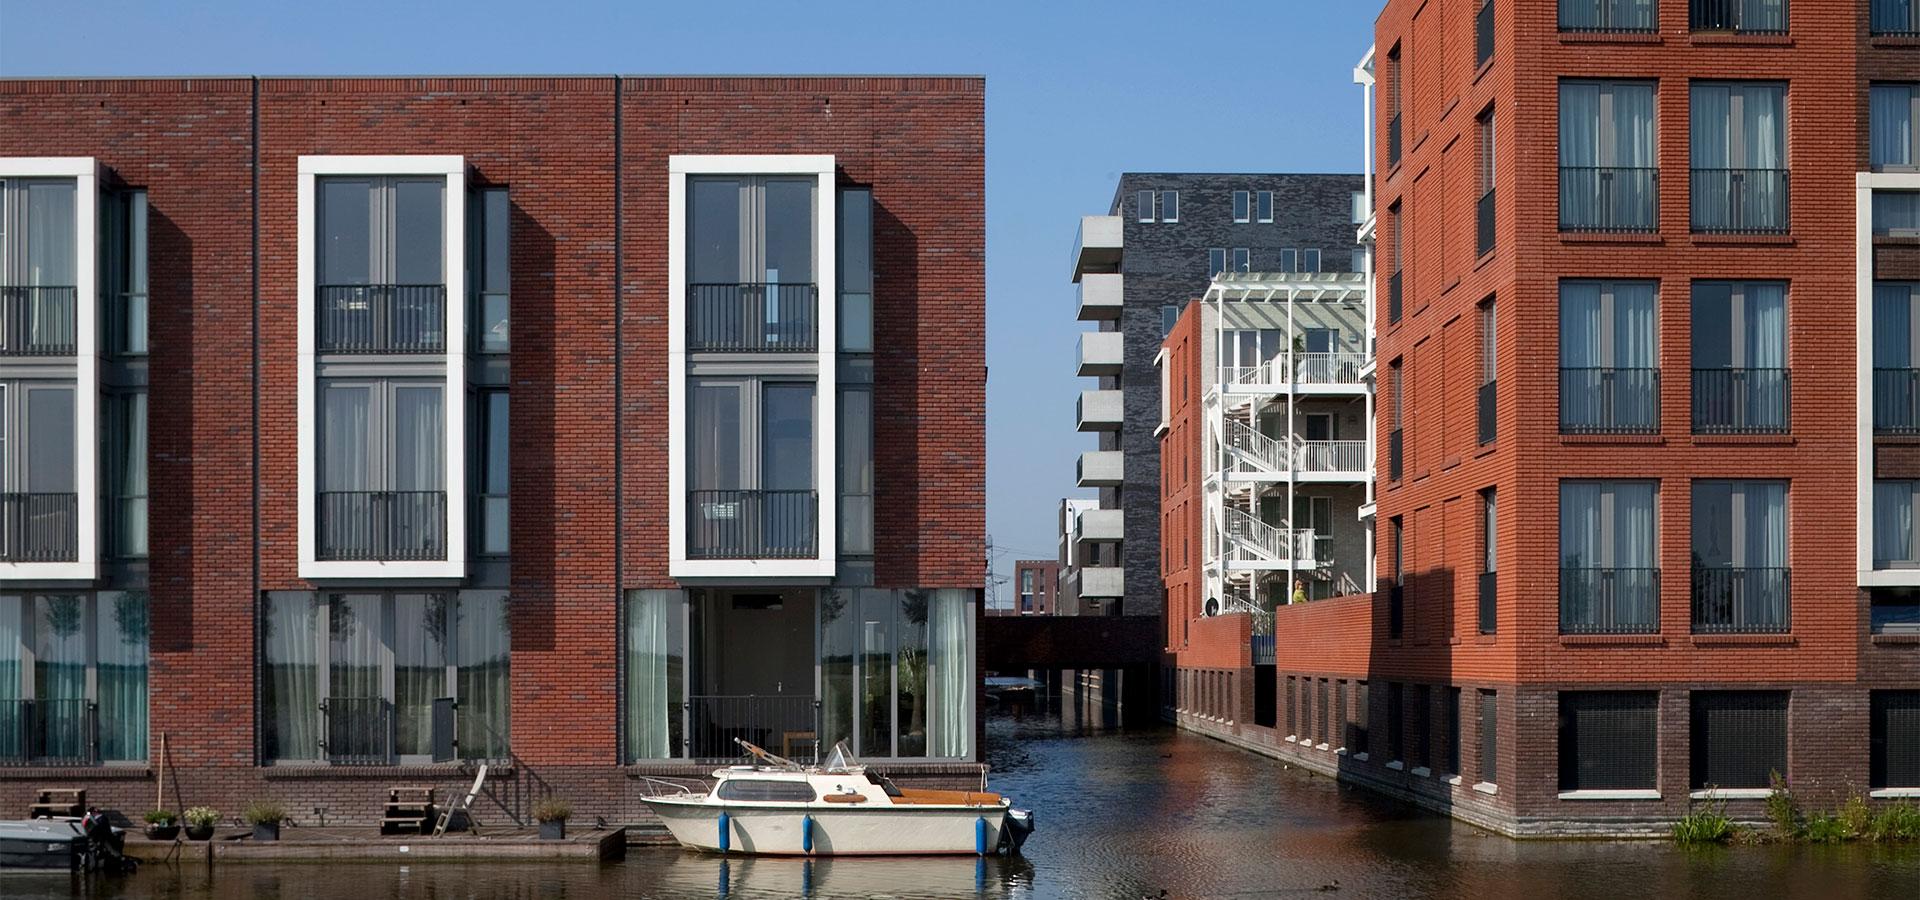 FARO architecten Blok 25 Haveneiland IJburg Amsterdam 05